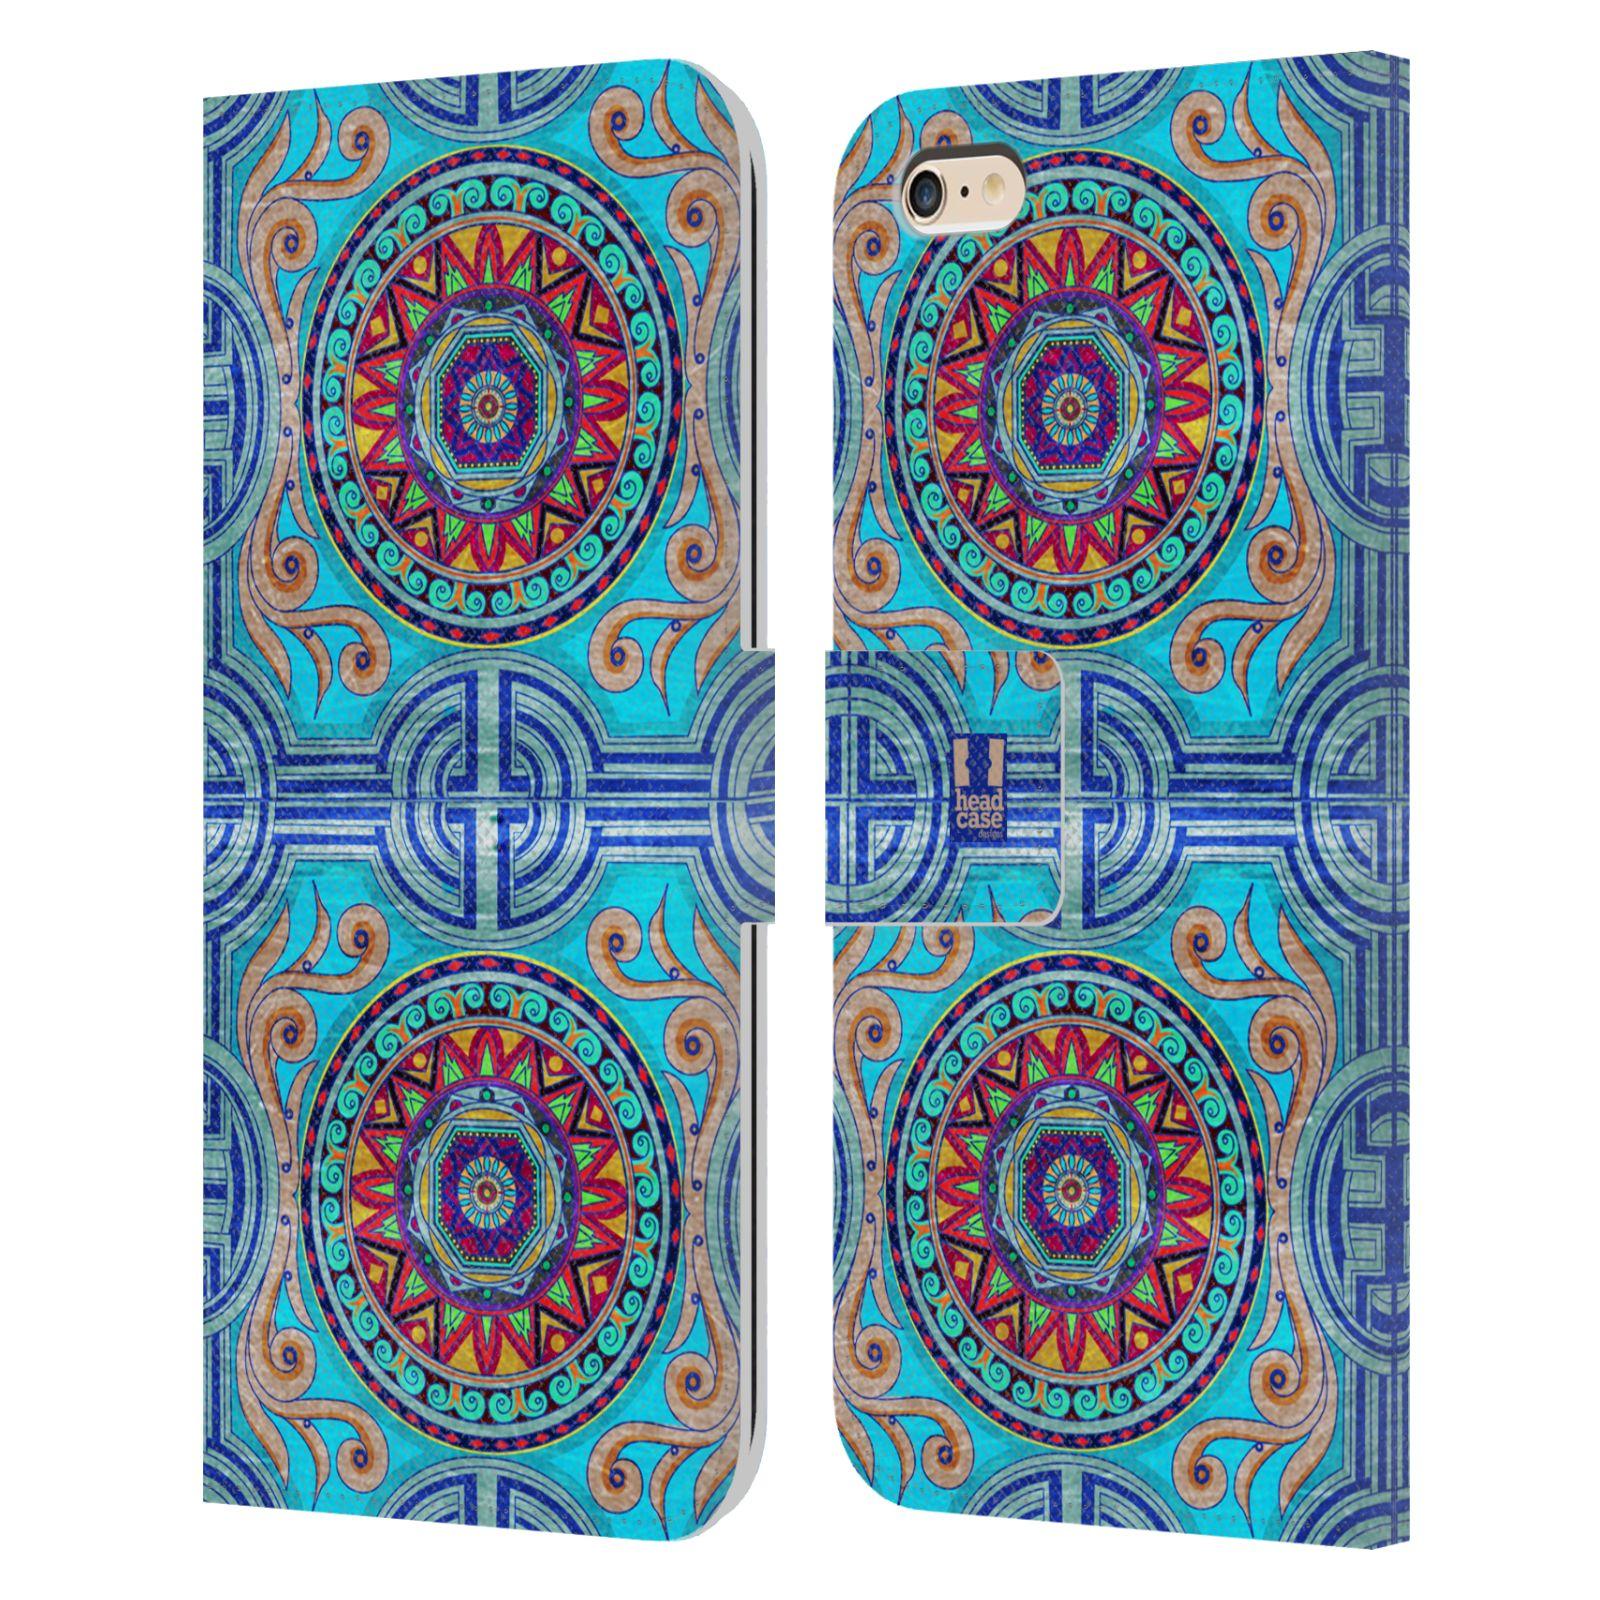 HEAD CASE Flipové pouzdro pro mobil Apple Iphone 6 PLUS / 6S PLUS ARABESKA modrá